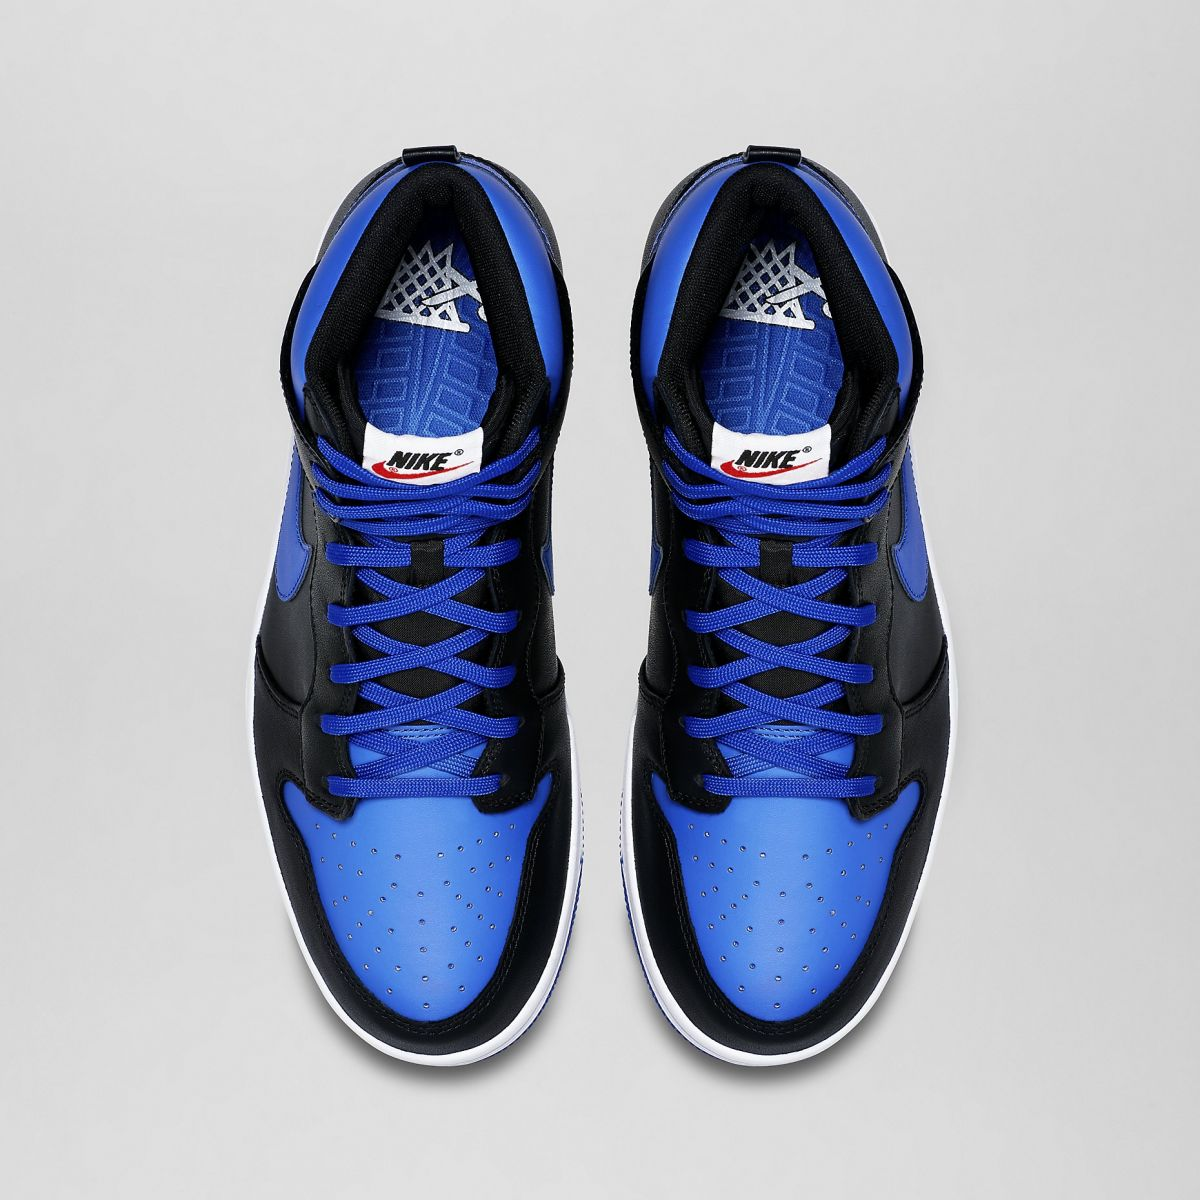 wholesale dealer 797c6 f7053 More Nike Dunks That Look Like Air Jordans